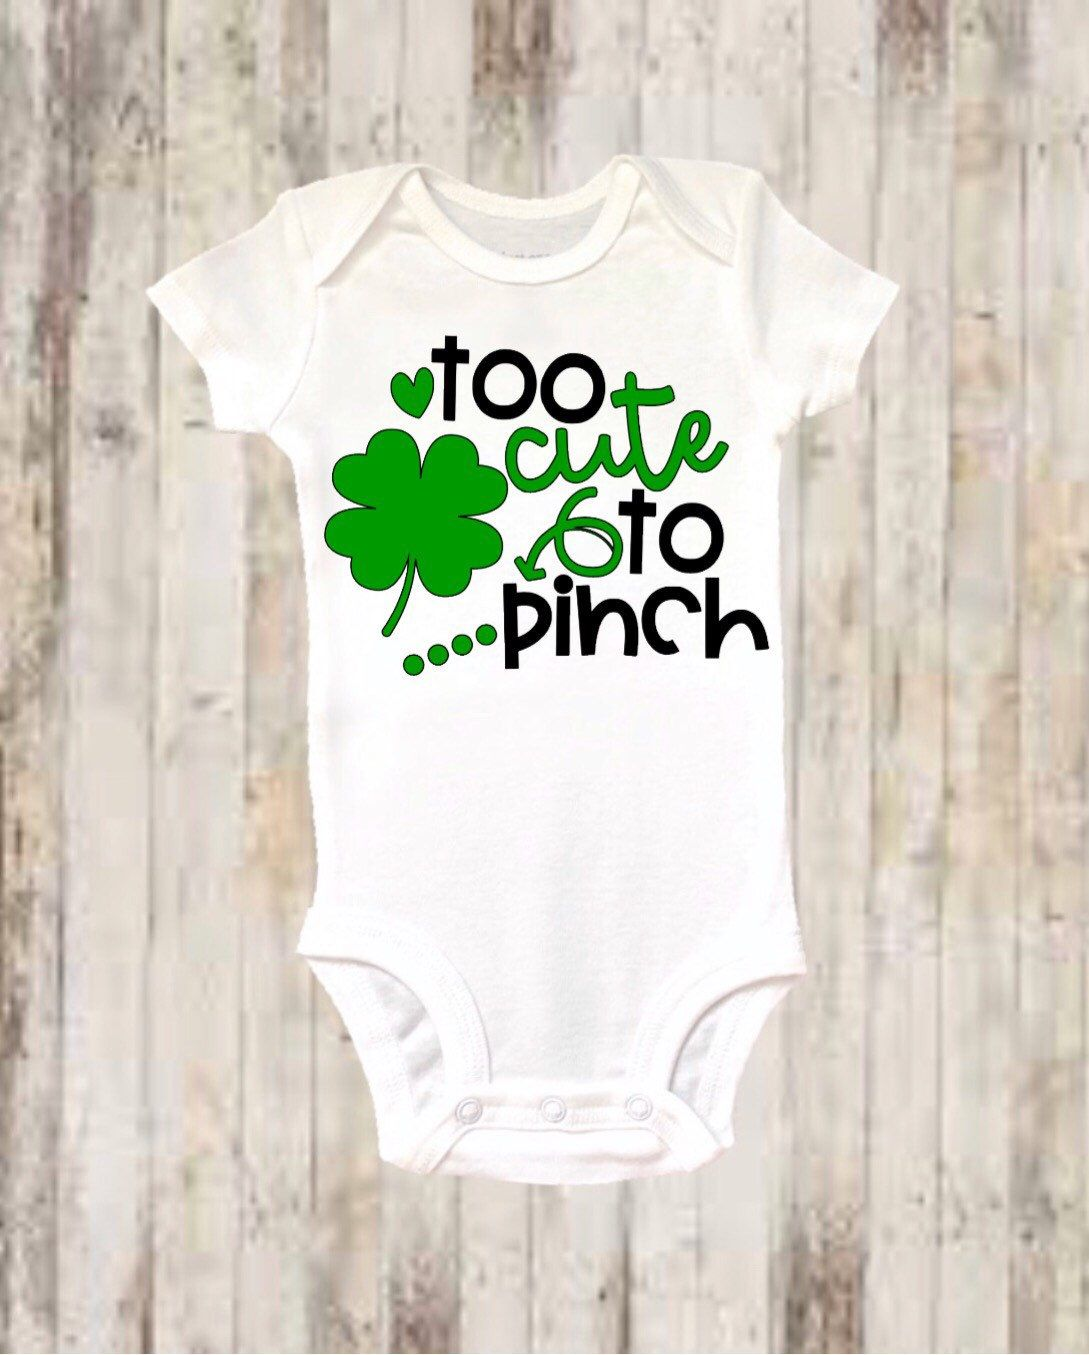 White Soft Cotton New Personalised Boys Girls T-shirt Tees Lucky Irish Baby